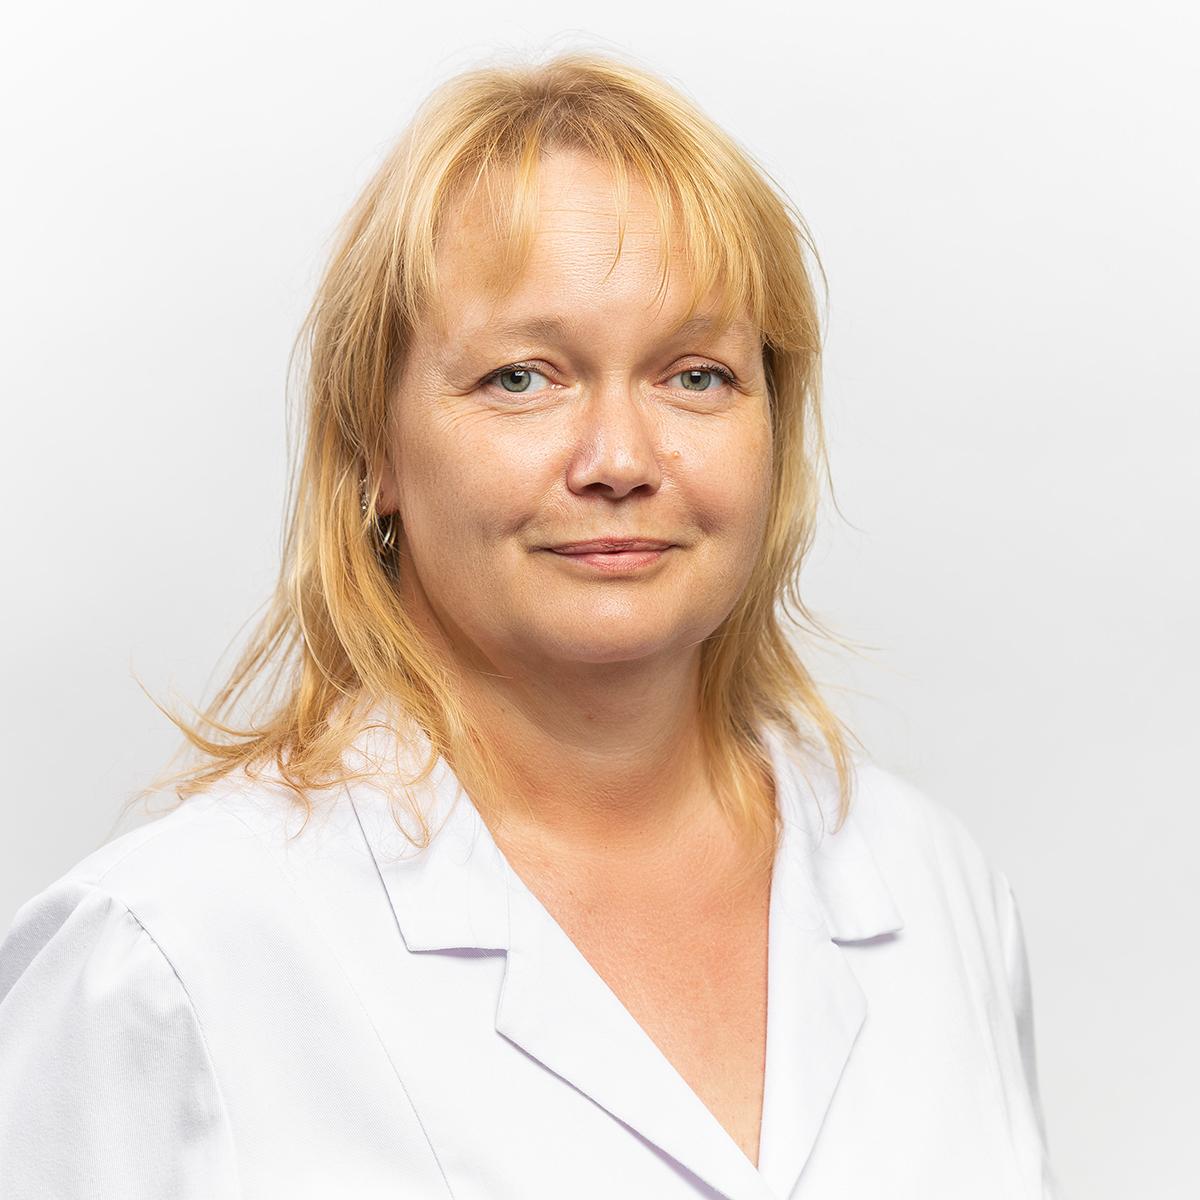 Nicole Klöpper